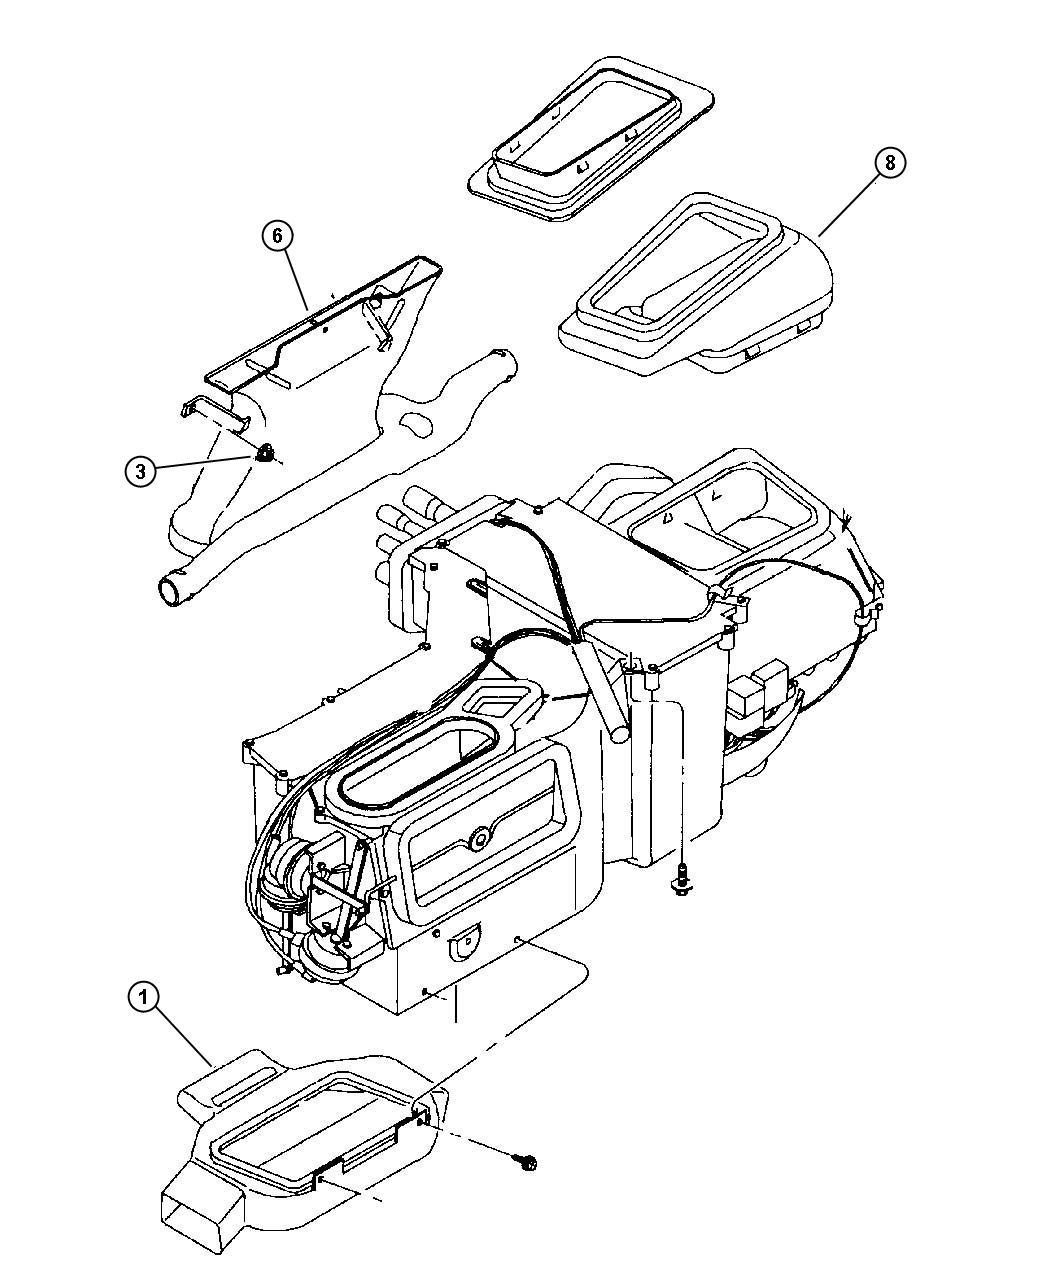 Jeep Wrangler Duct Fresh Air Intake